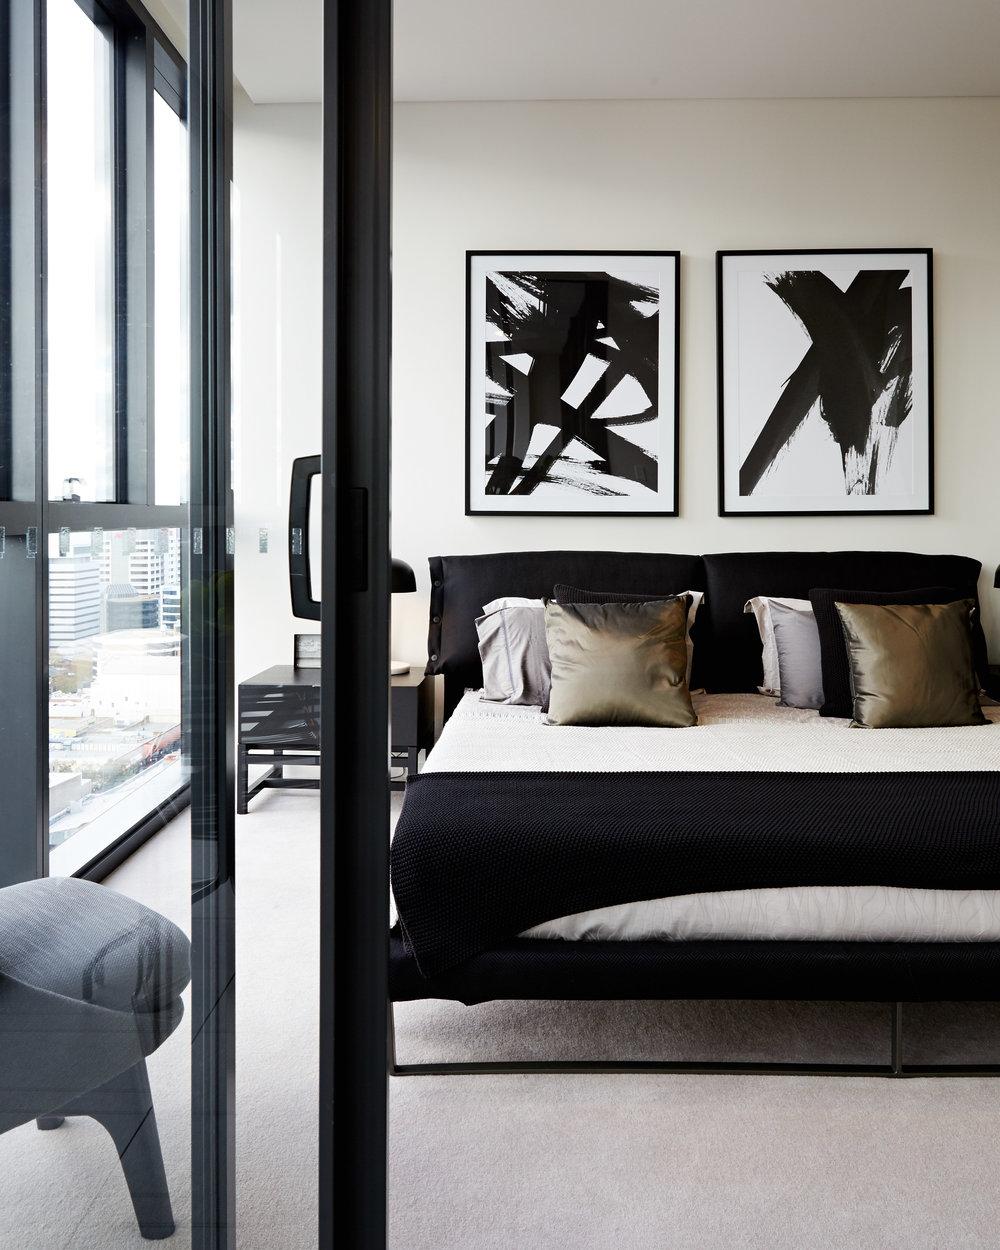 170609_Apartment_shots_21.jpg